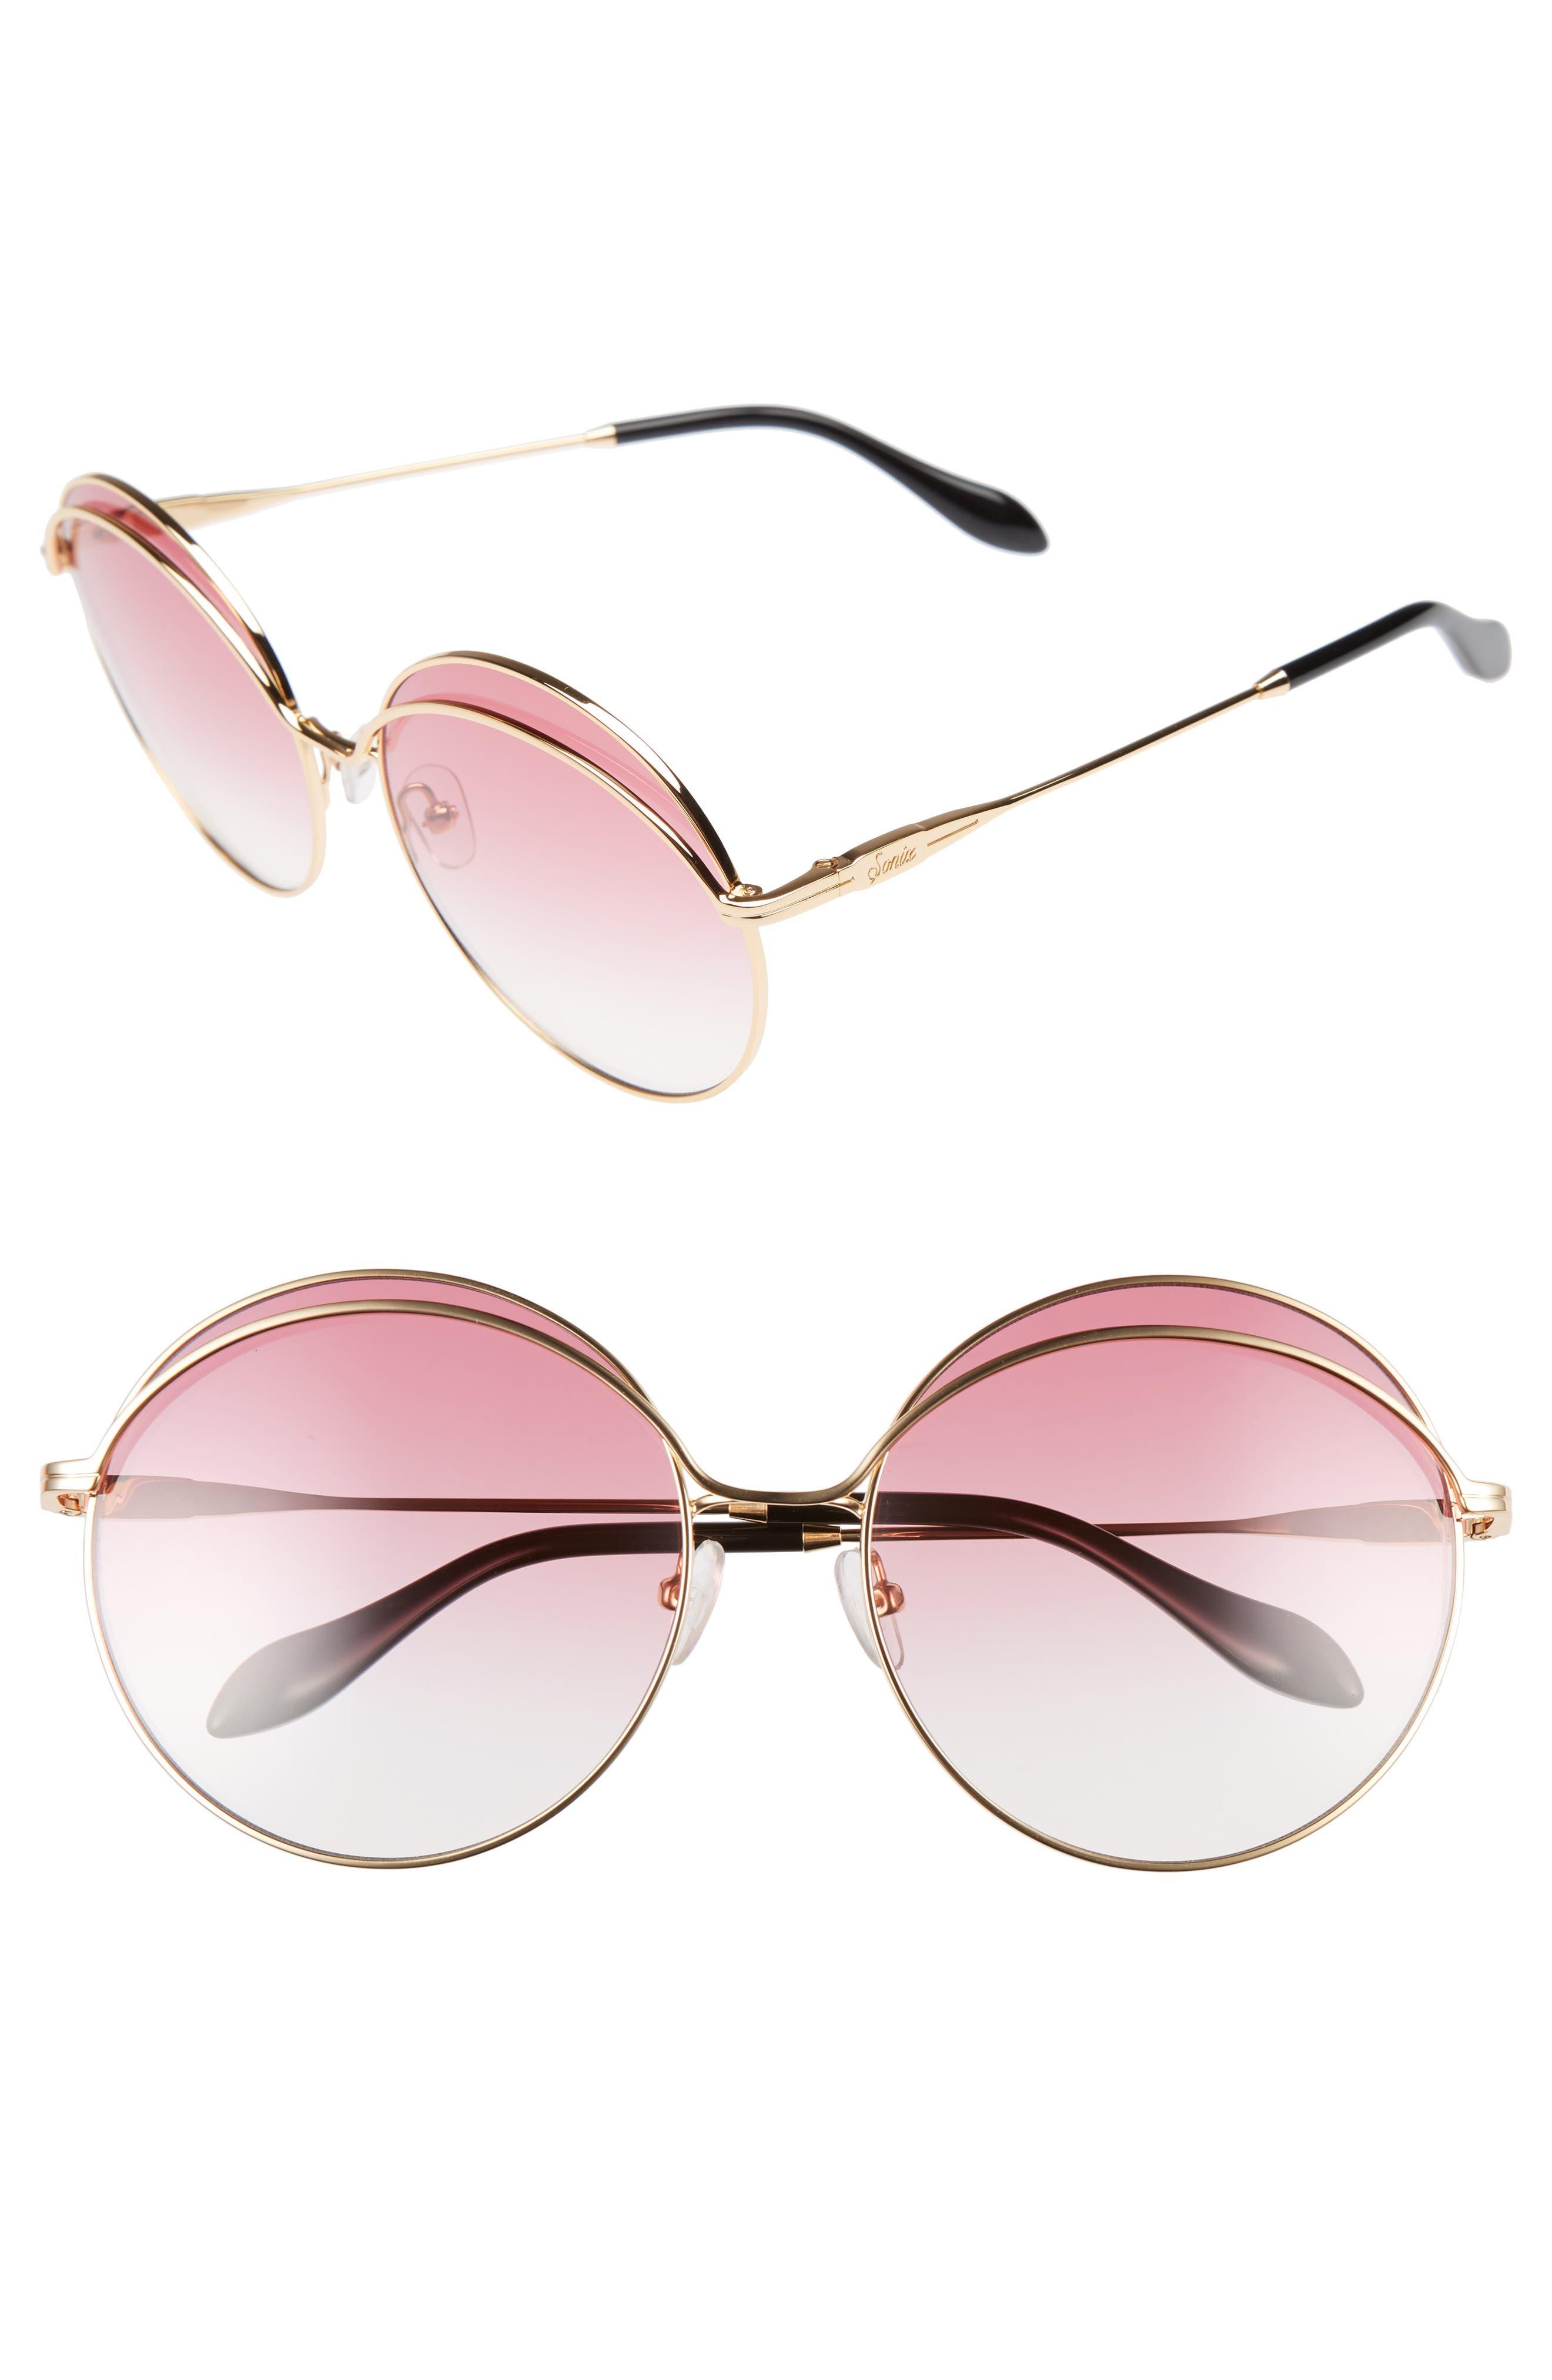 Sonix Oasis 63mm Round Sunglasses